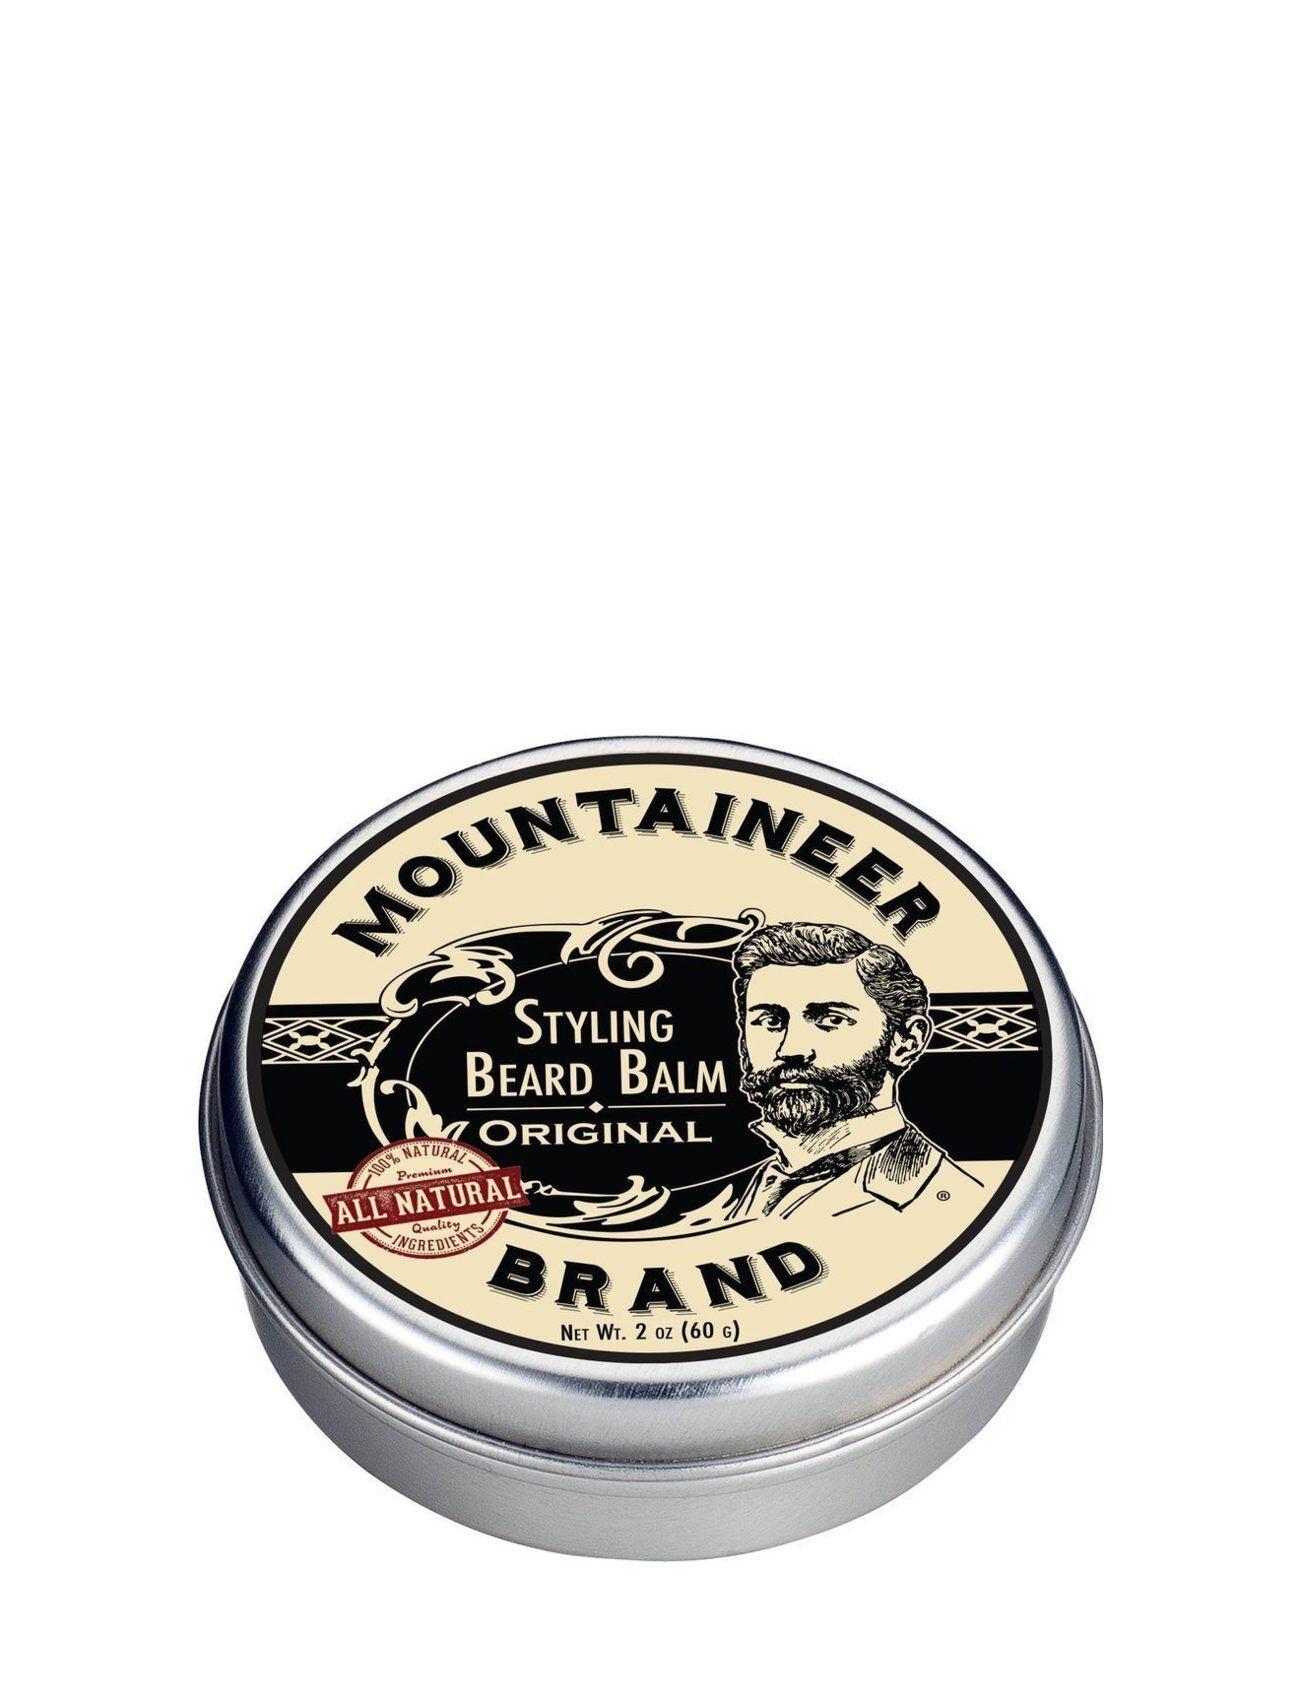 Mountaineer Brand Heavy Duty Timber Beard Balm Beauty MEN Shaving Products Beard & Mustache Nude Mountaineer Brand